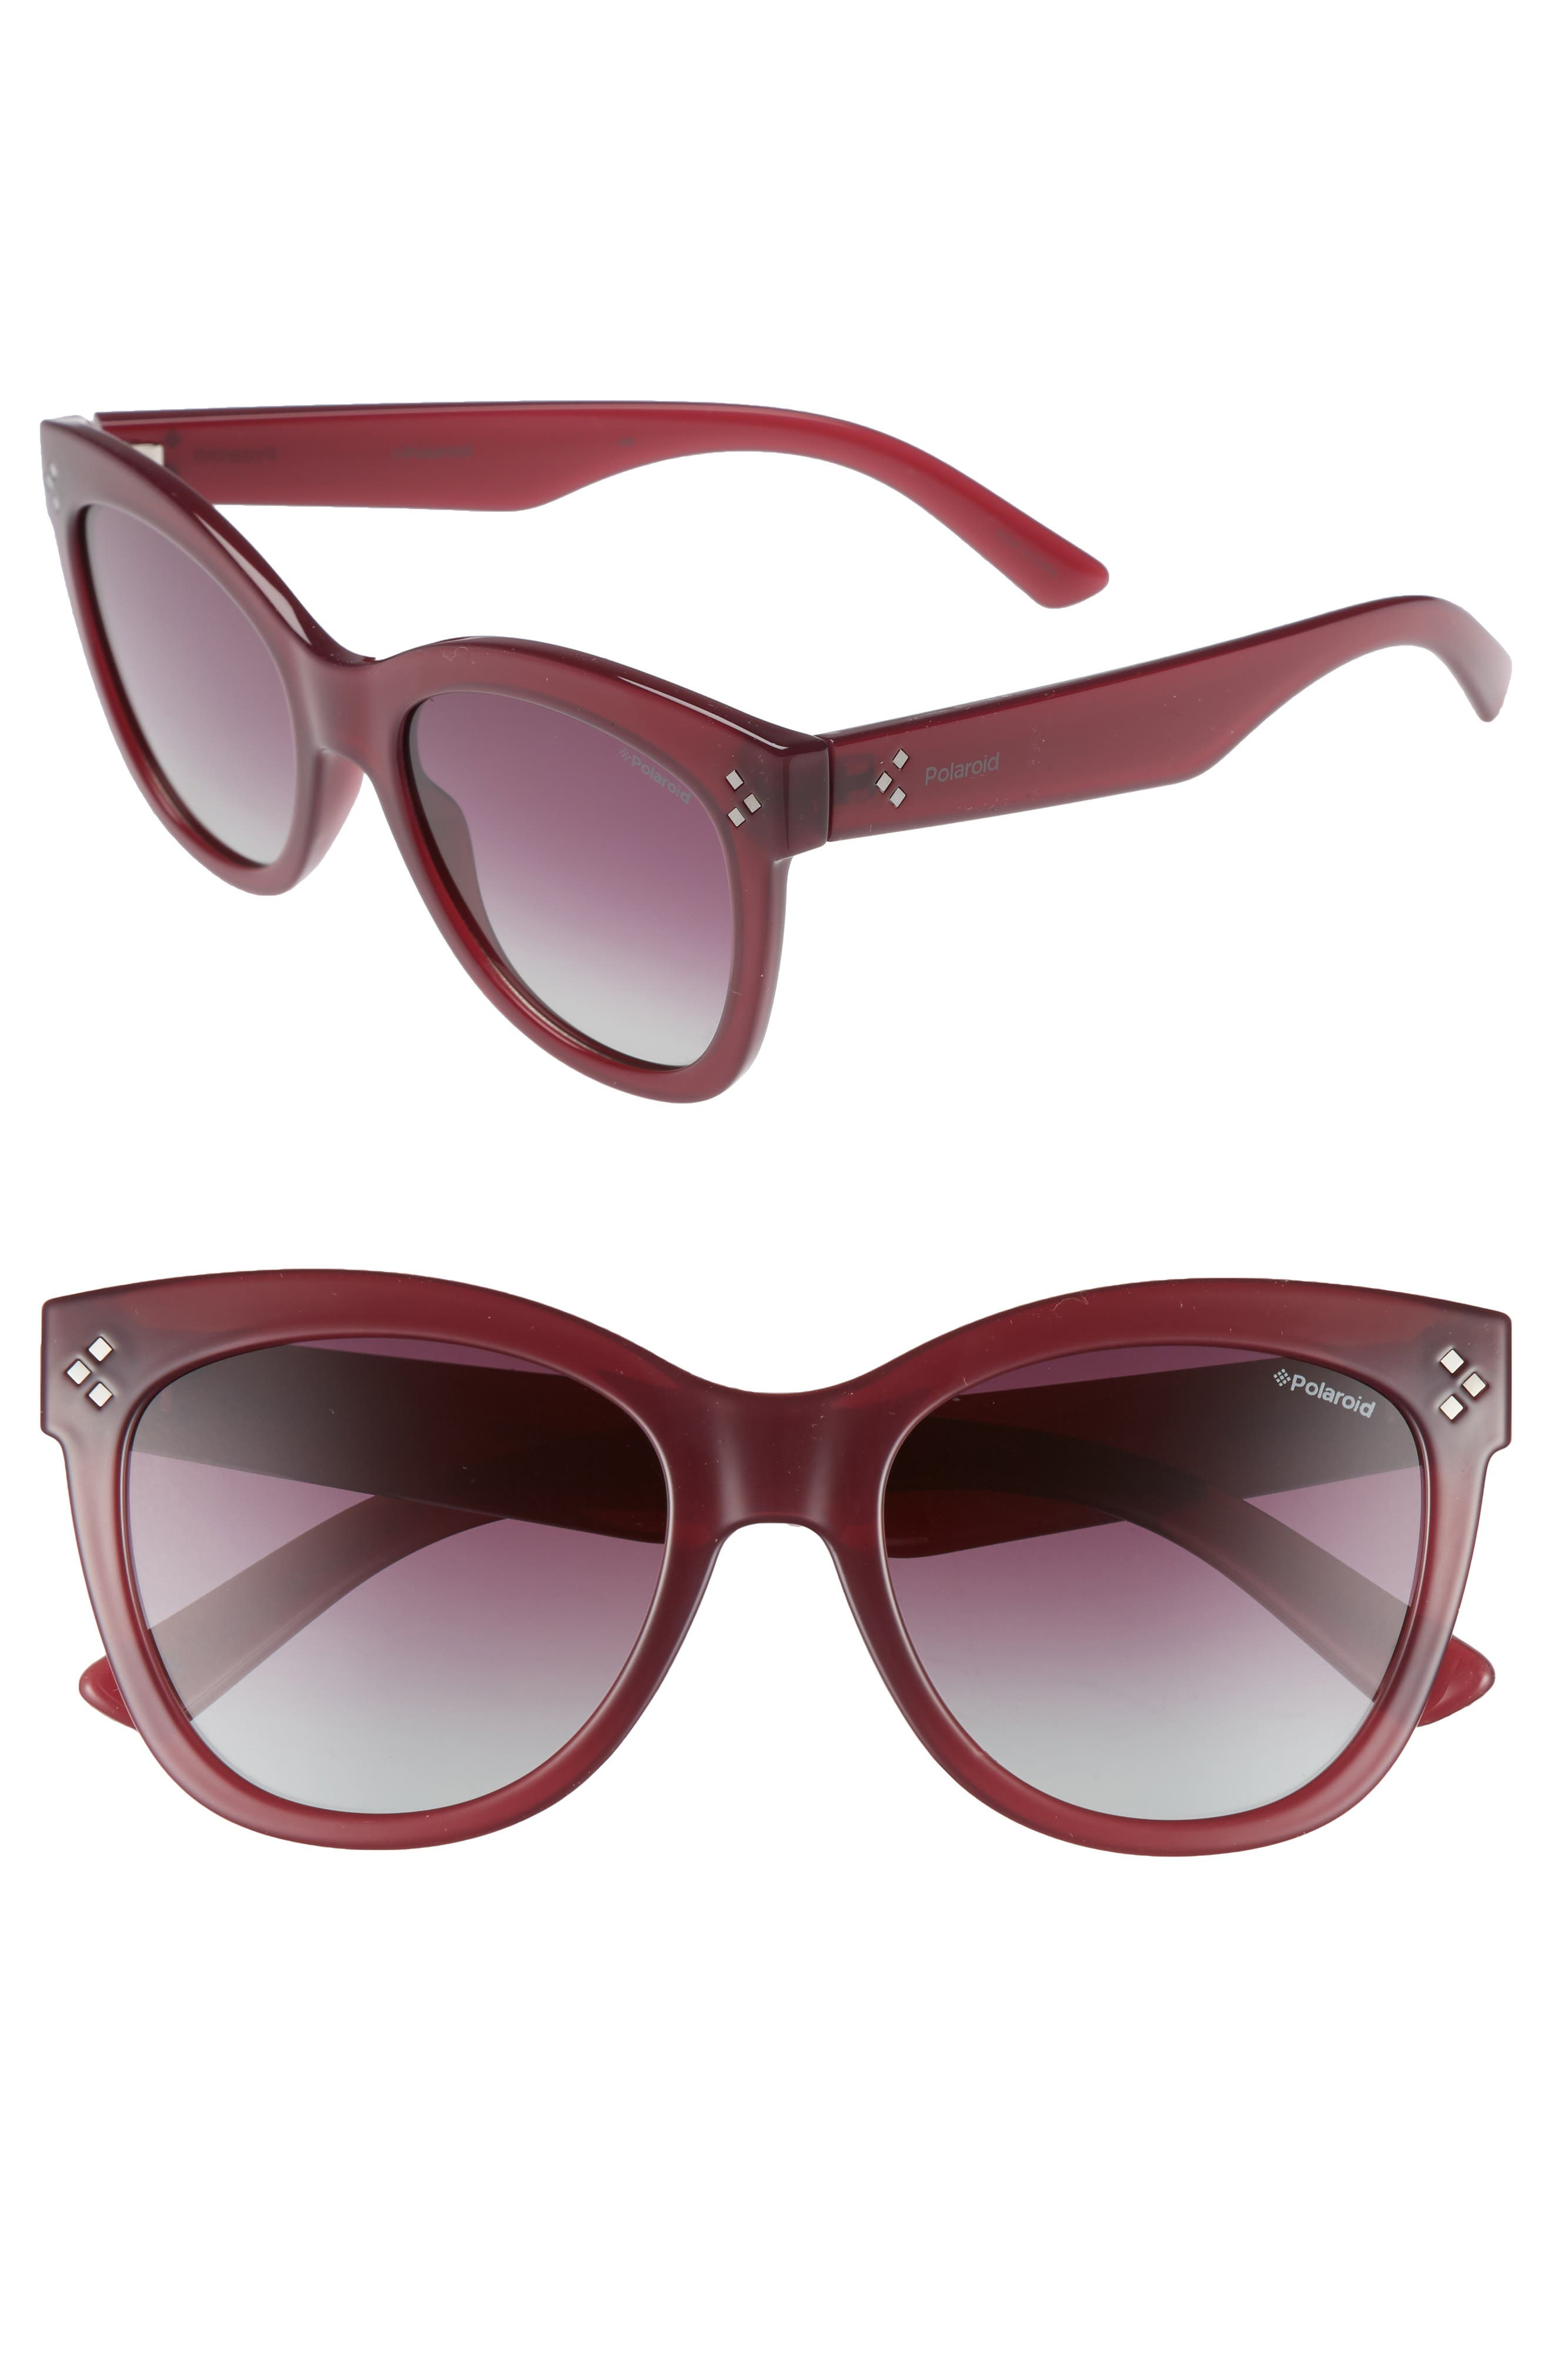 Polaroid 5m Polarized Sunglasses - Red